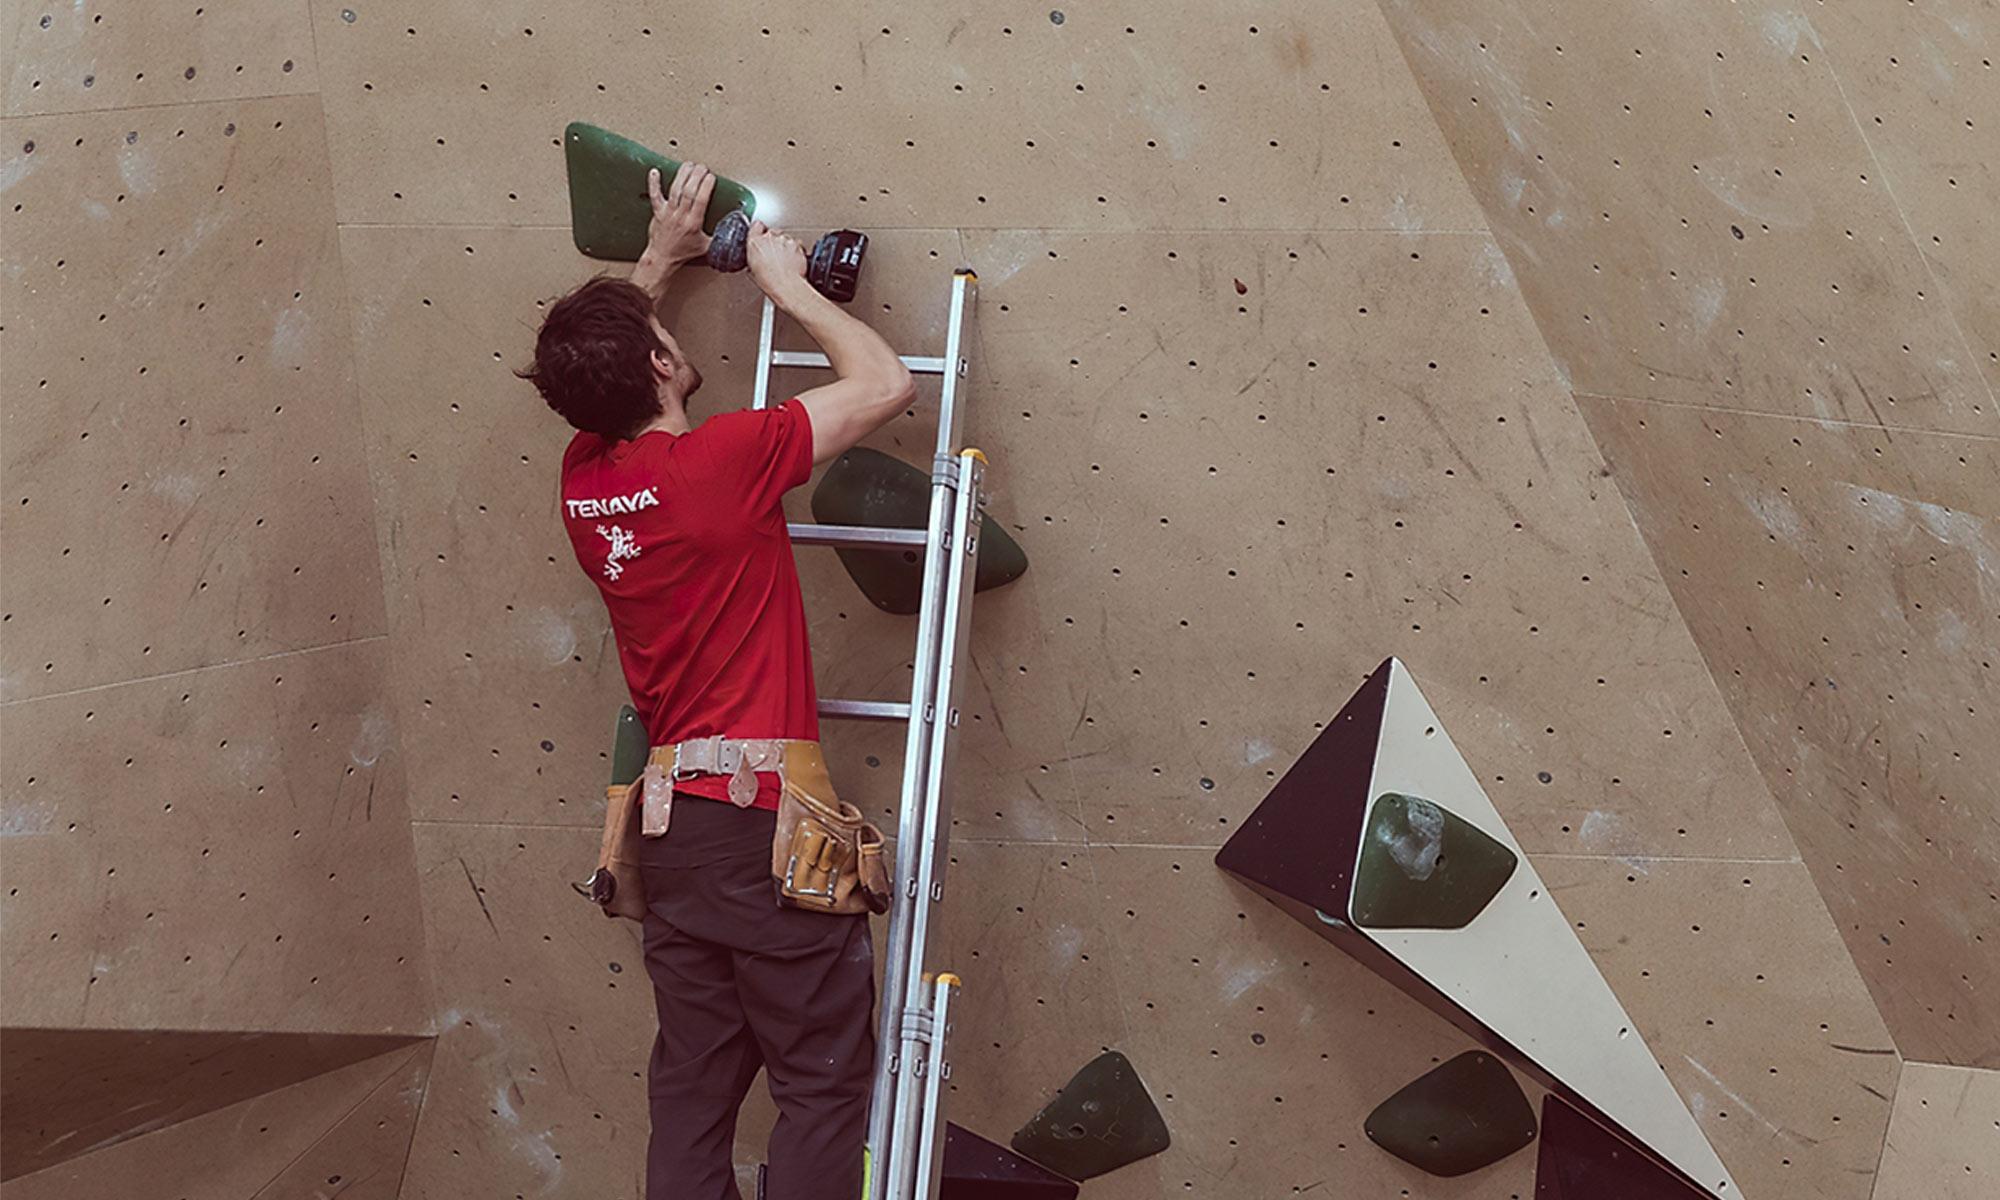 Comment construire son mur d'escalade chez soi ?